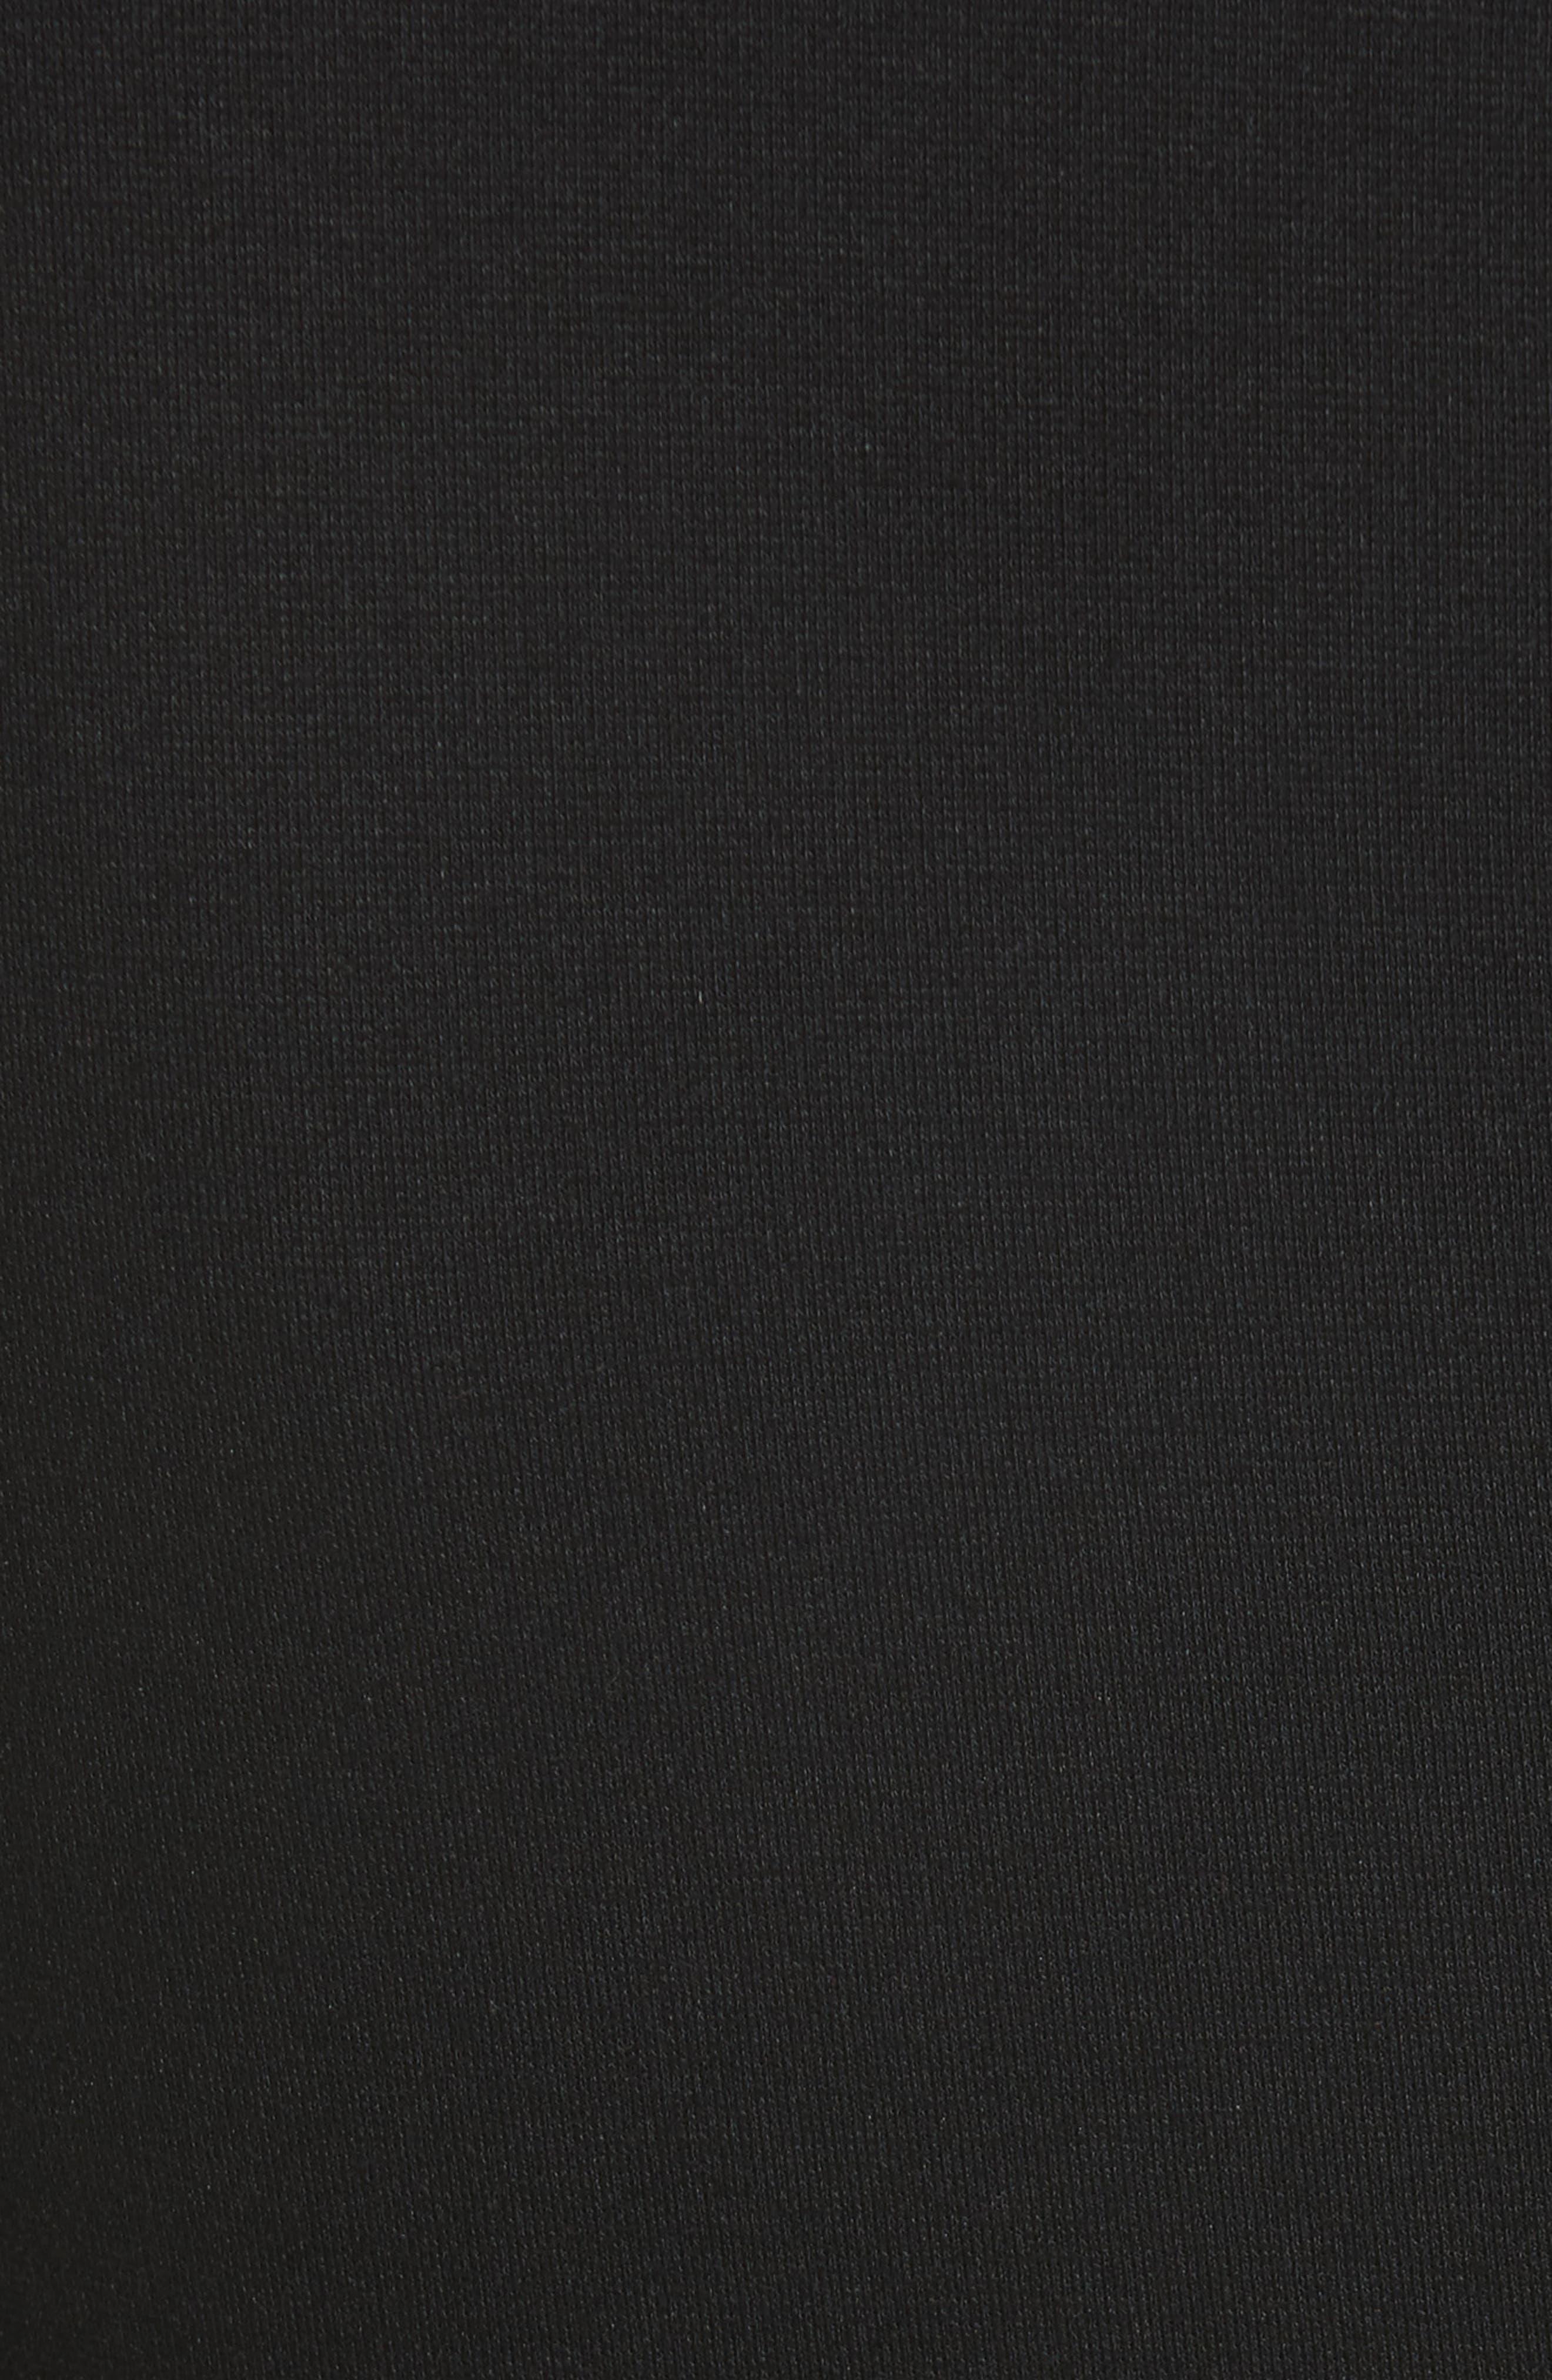 Collection Cutout Sheath Dress,                             Alternate thumbnail 5, color,                             001